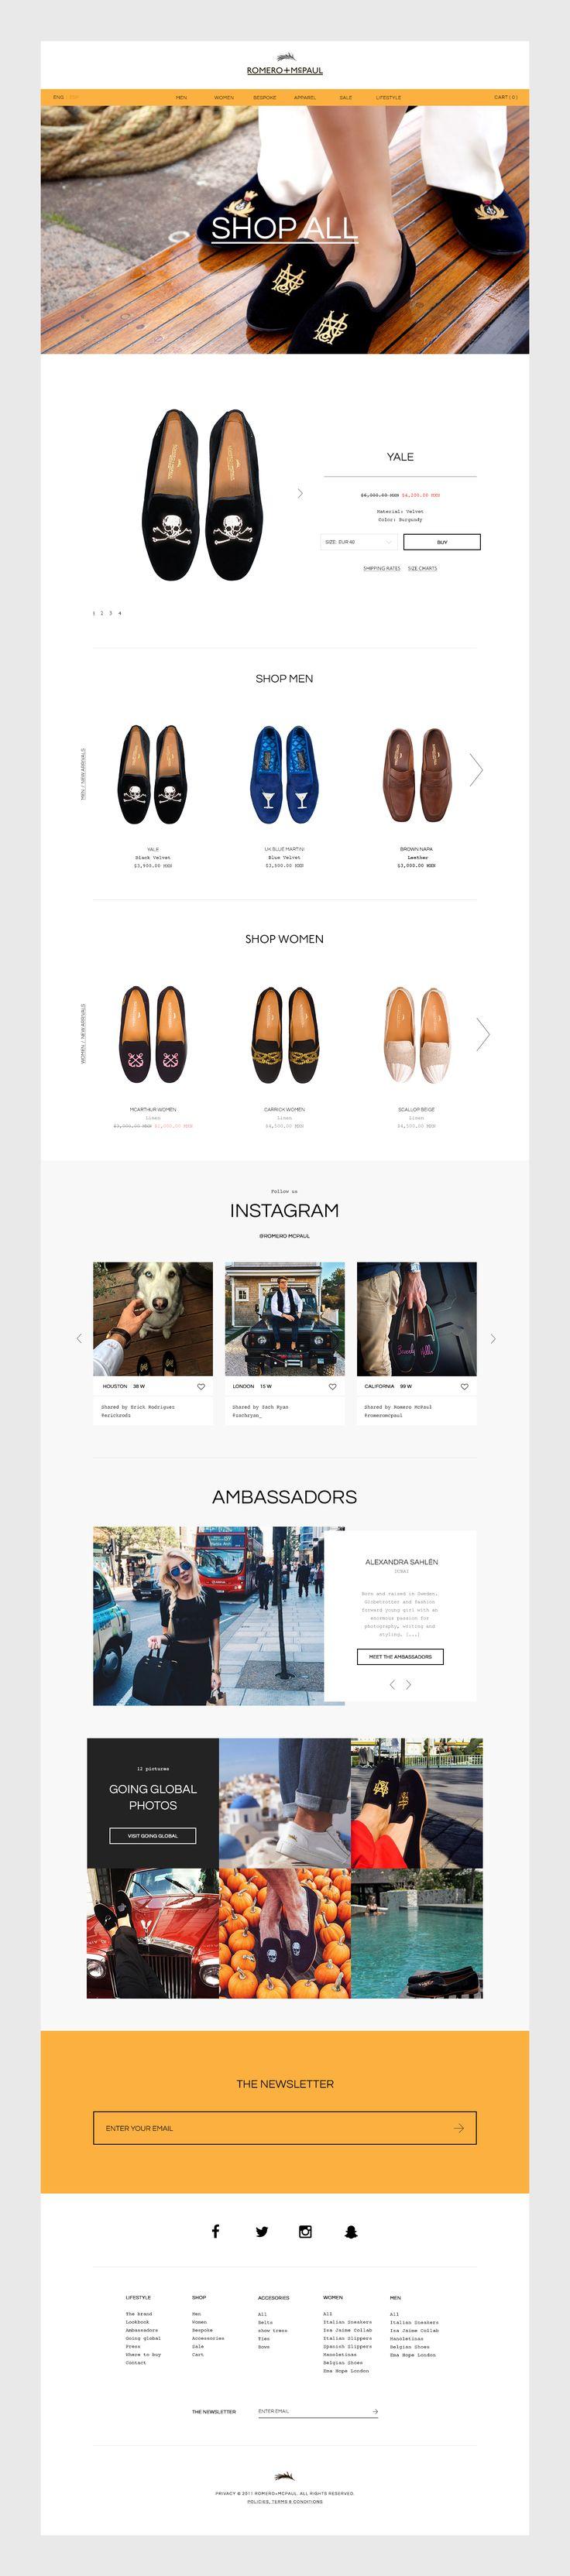 Romero McPaul Website on Behance